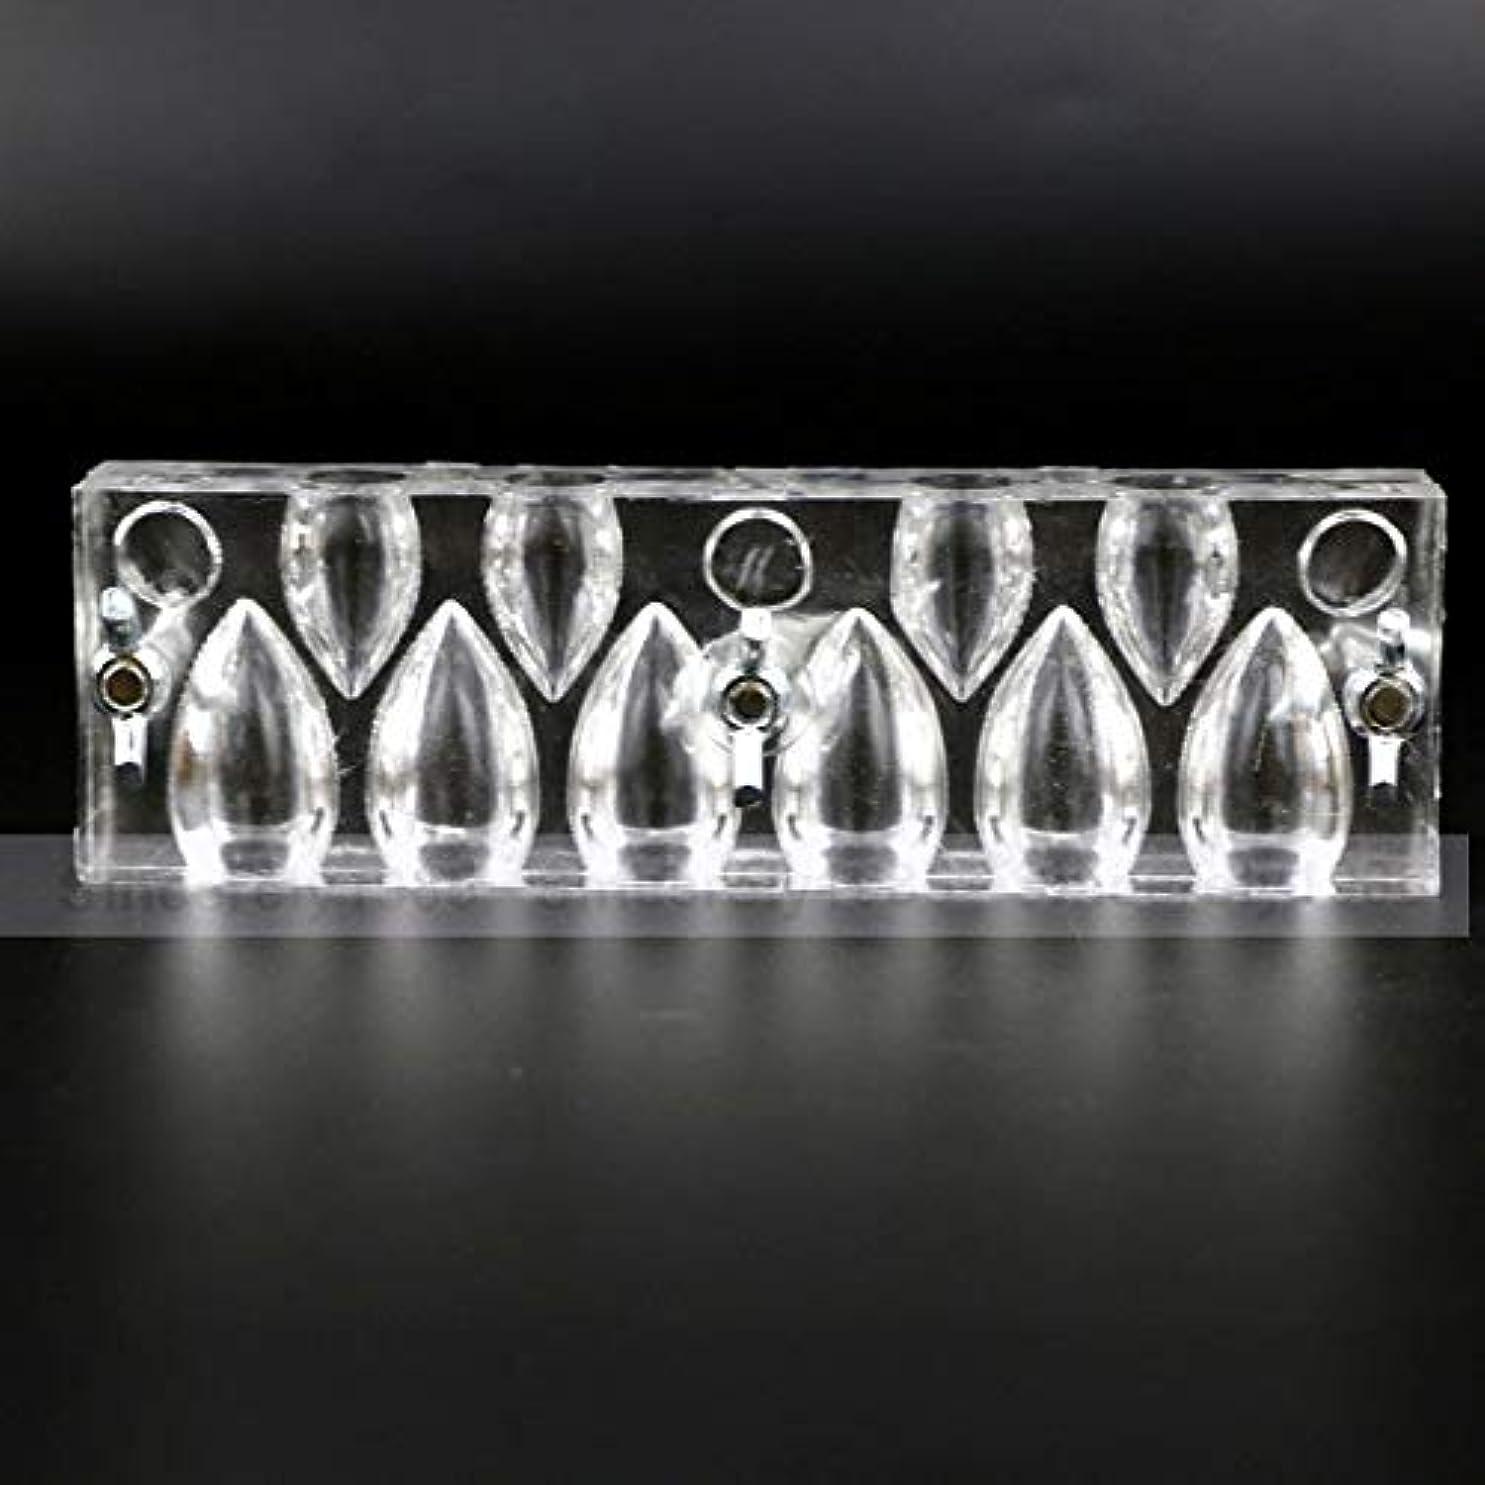 FidgetGear お香タワー グラウドコーン 型 DIY ツール アクリル 透明 初心者用 10 cones zhaoyujunUSW-SC-117-31BB904087